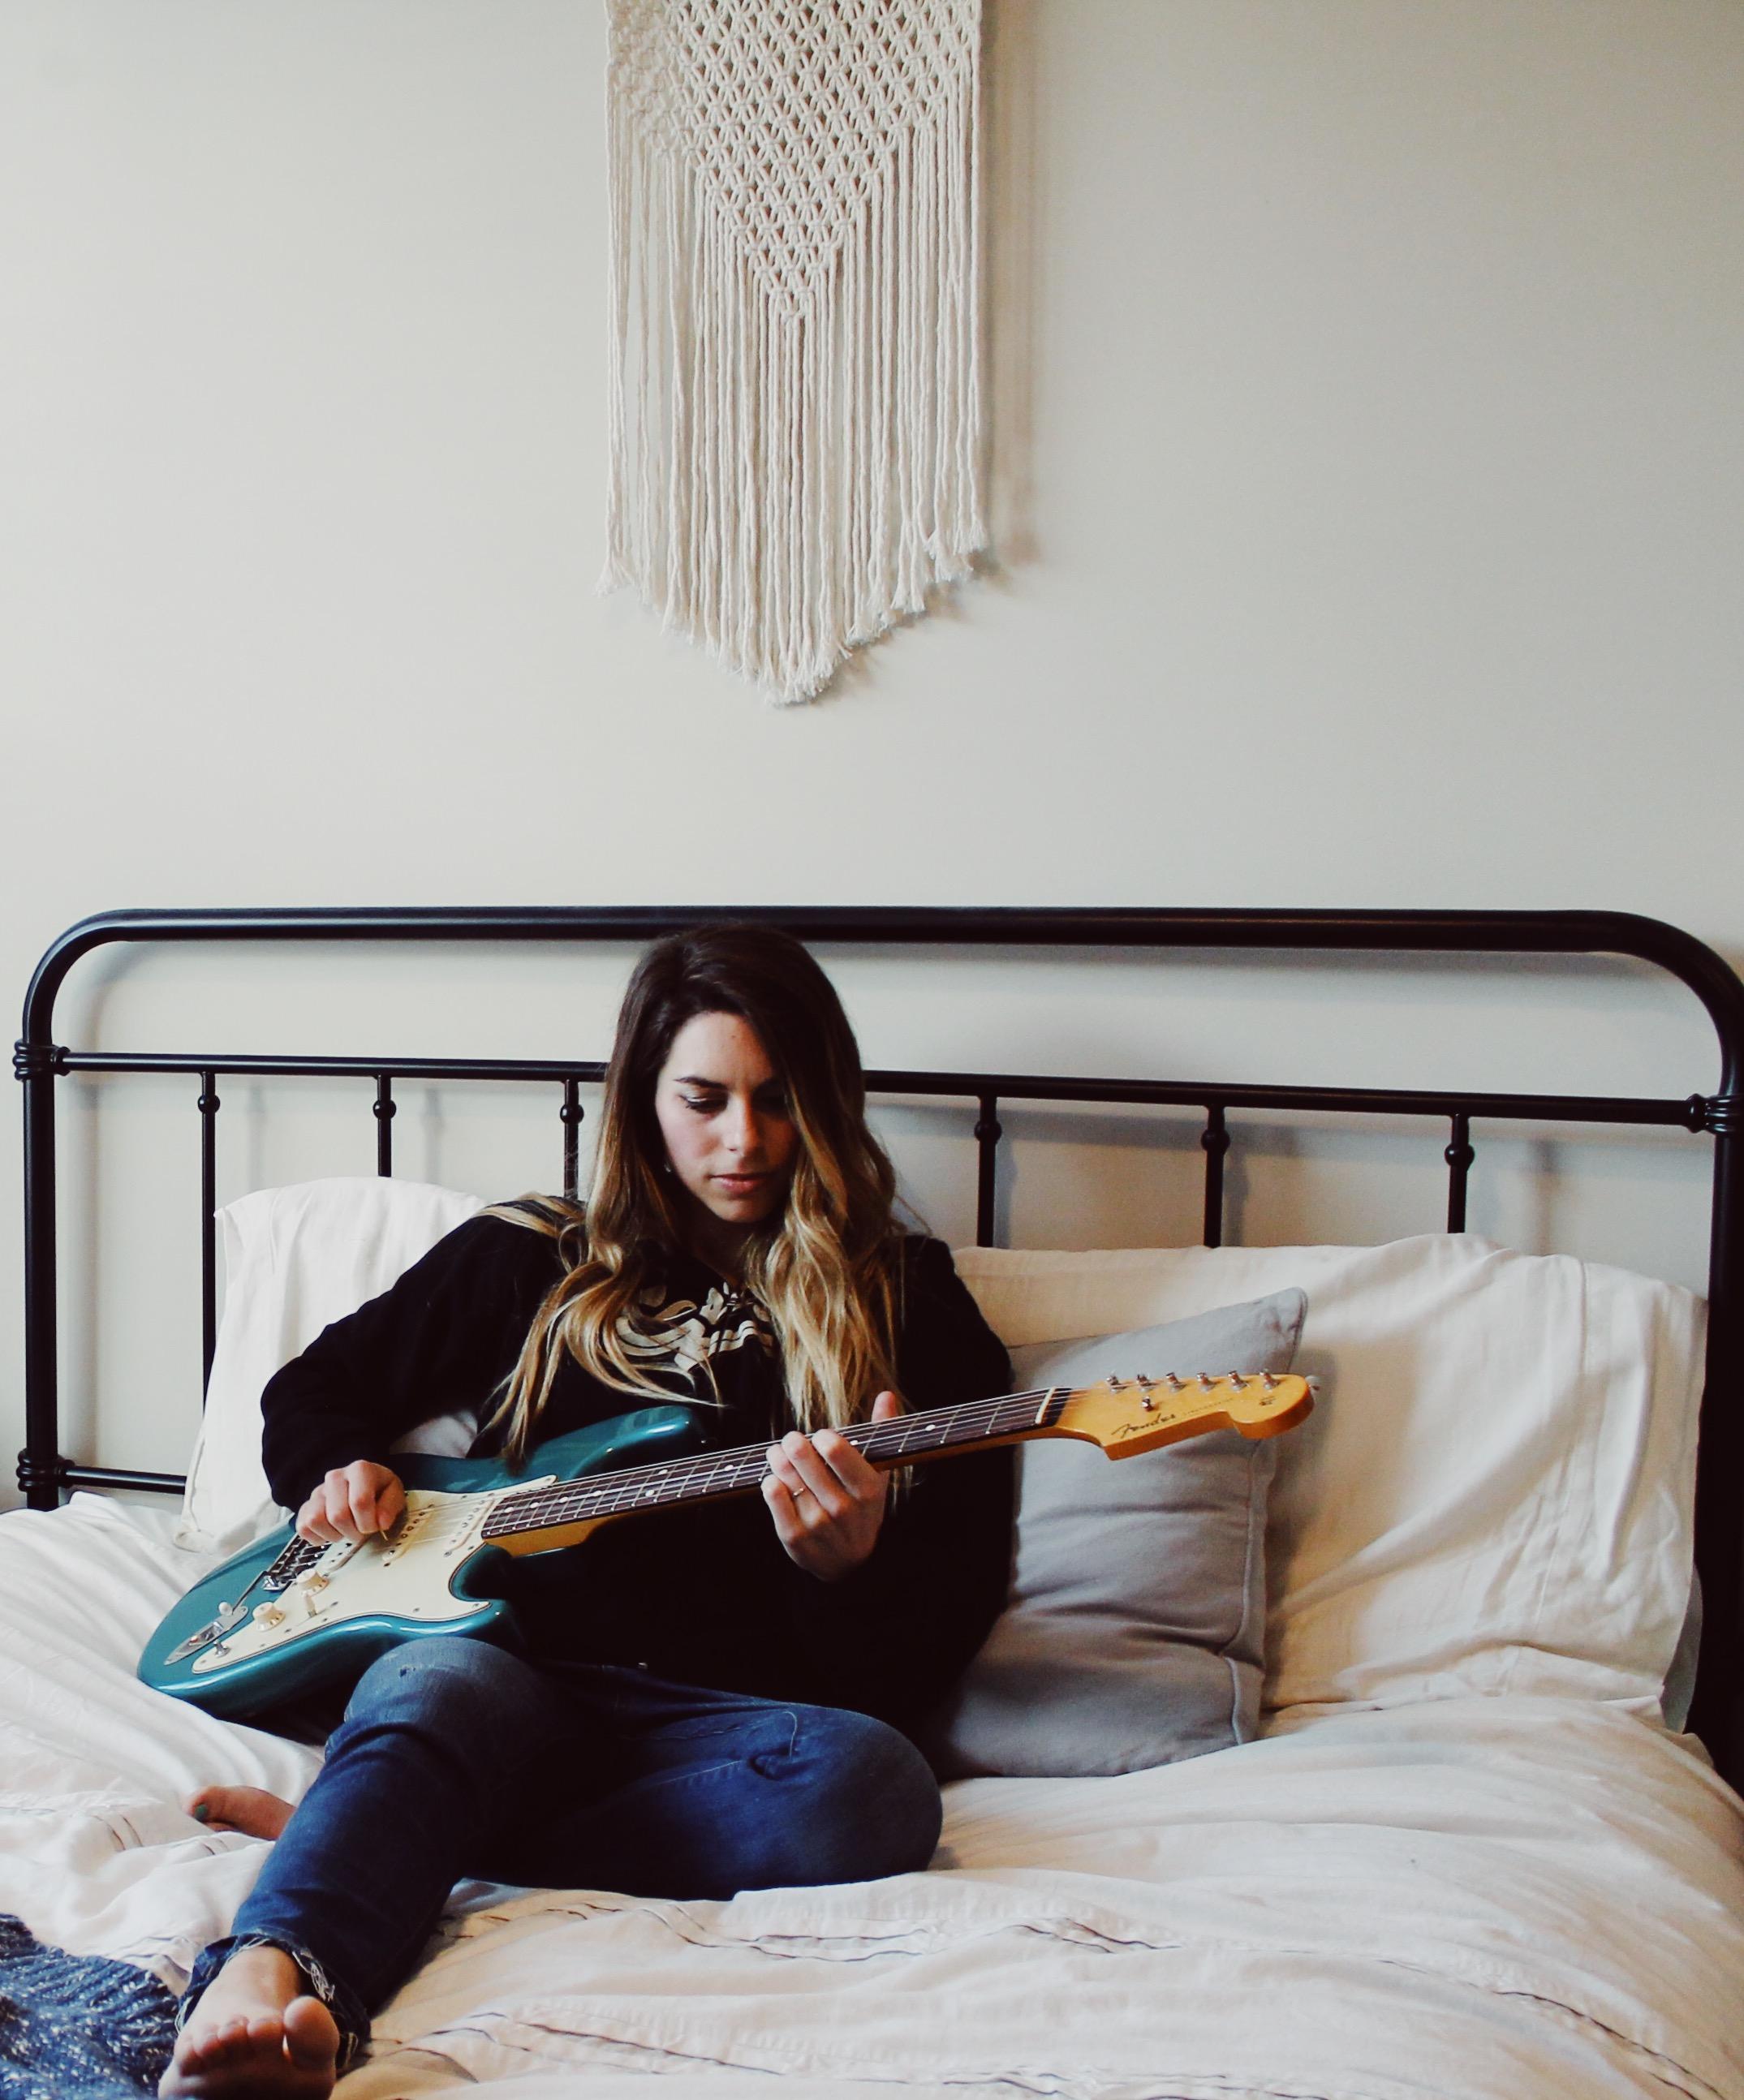 how to do a guitar video for instagram